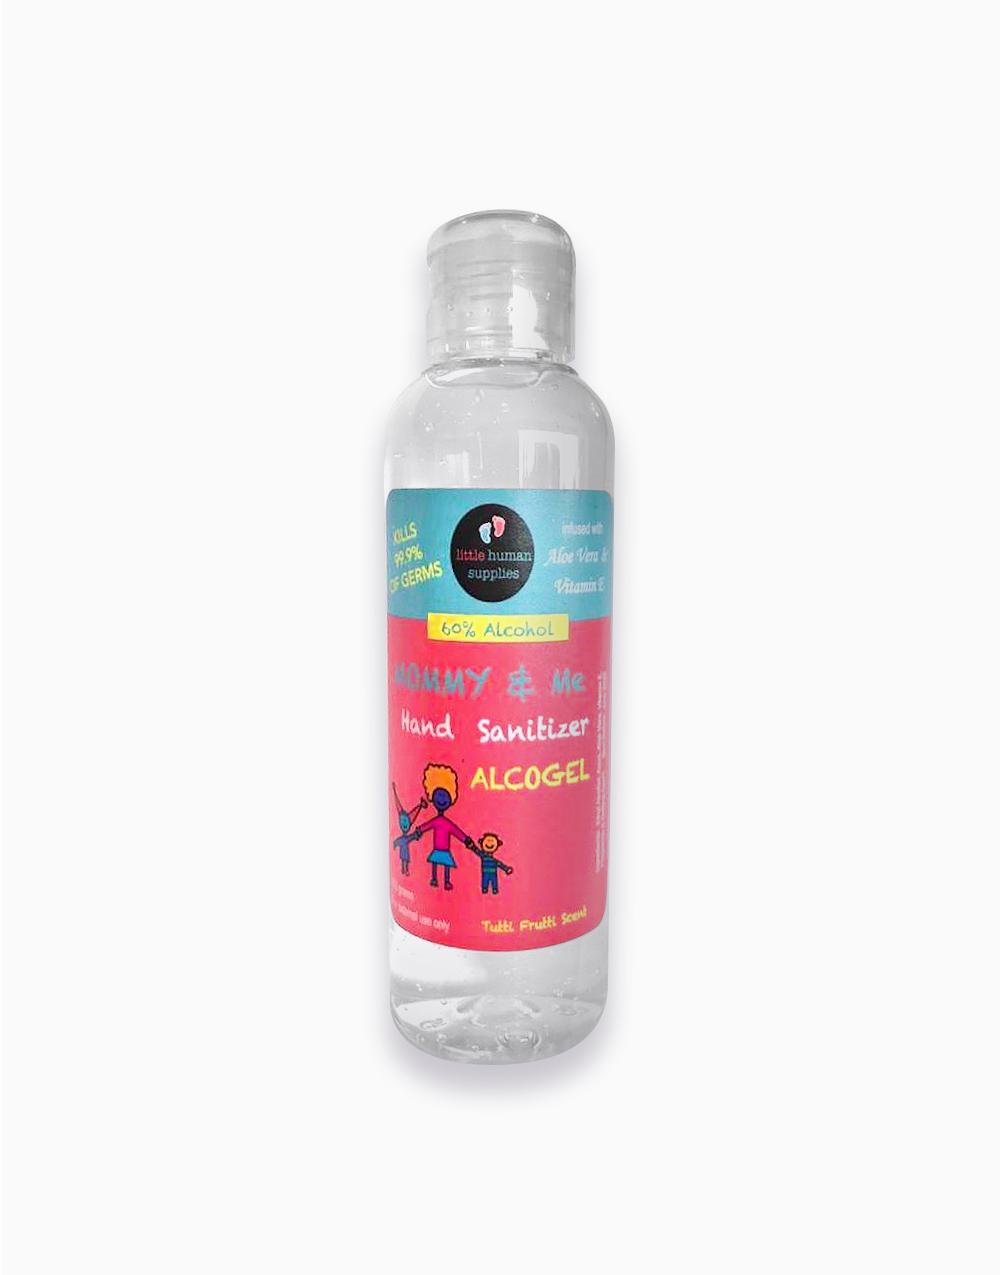 Alcogel Hand Sanitizer with Aloe Vera & Vitamin E (100ml) by Little Human Supplies